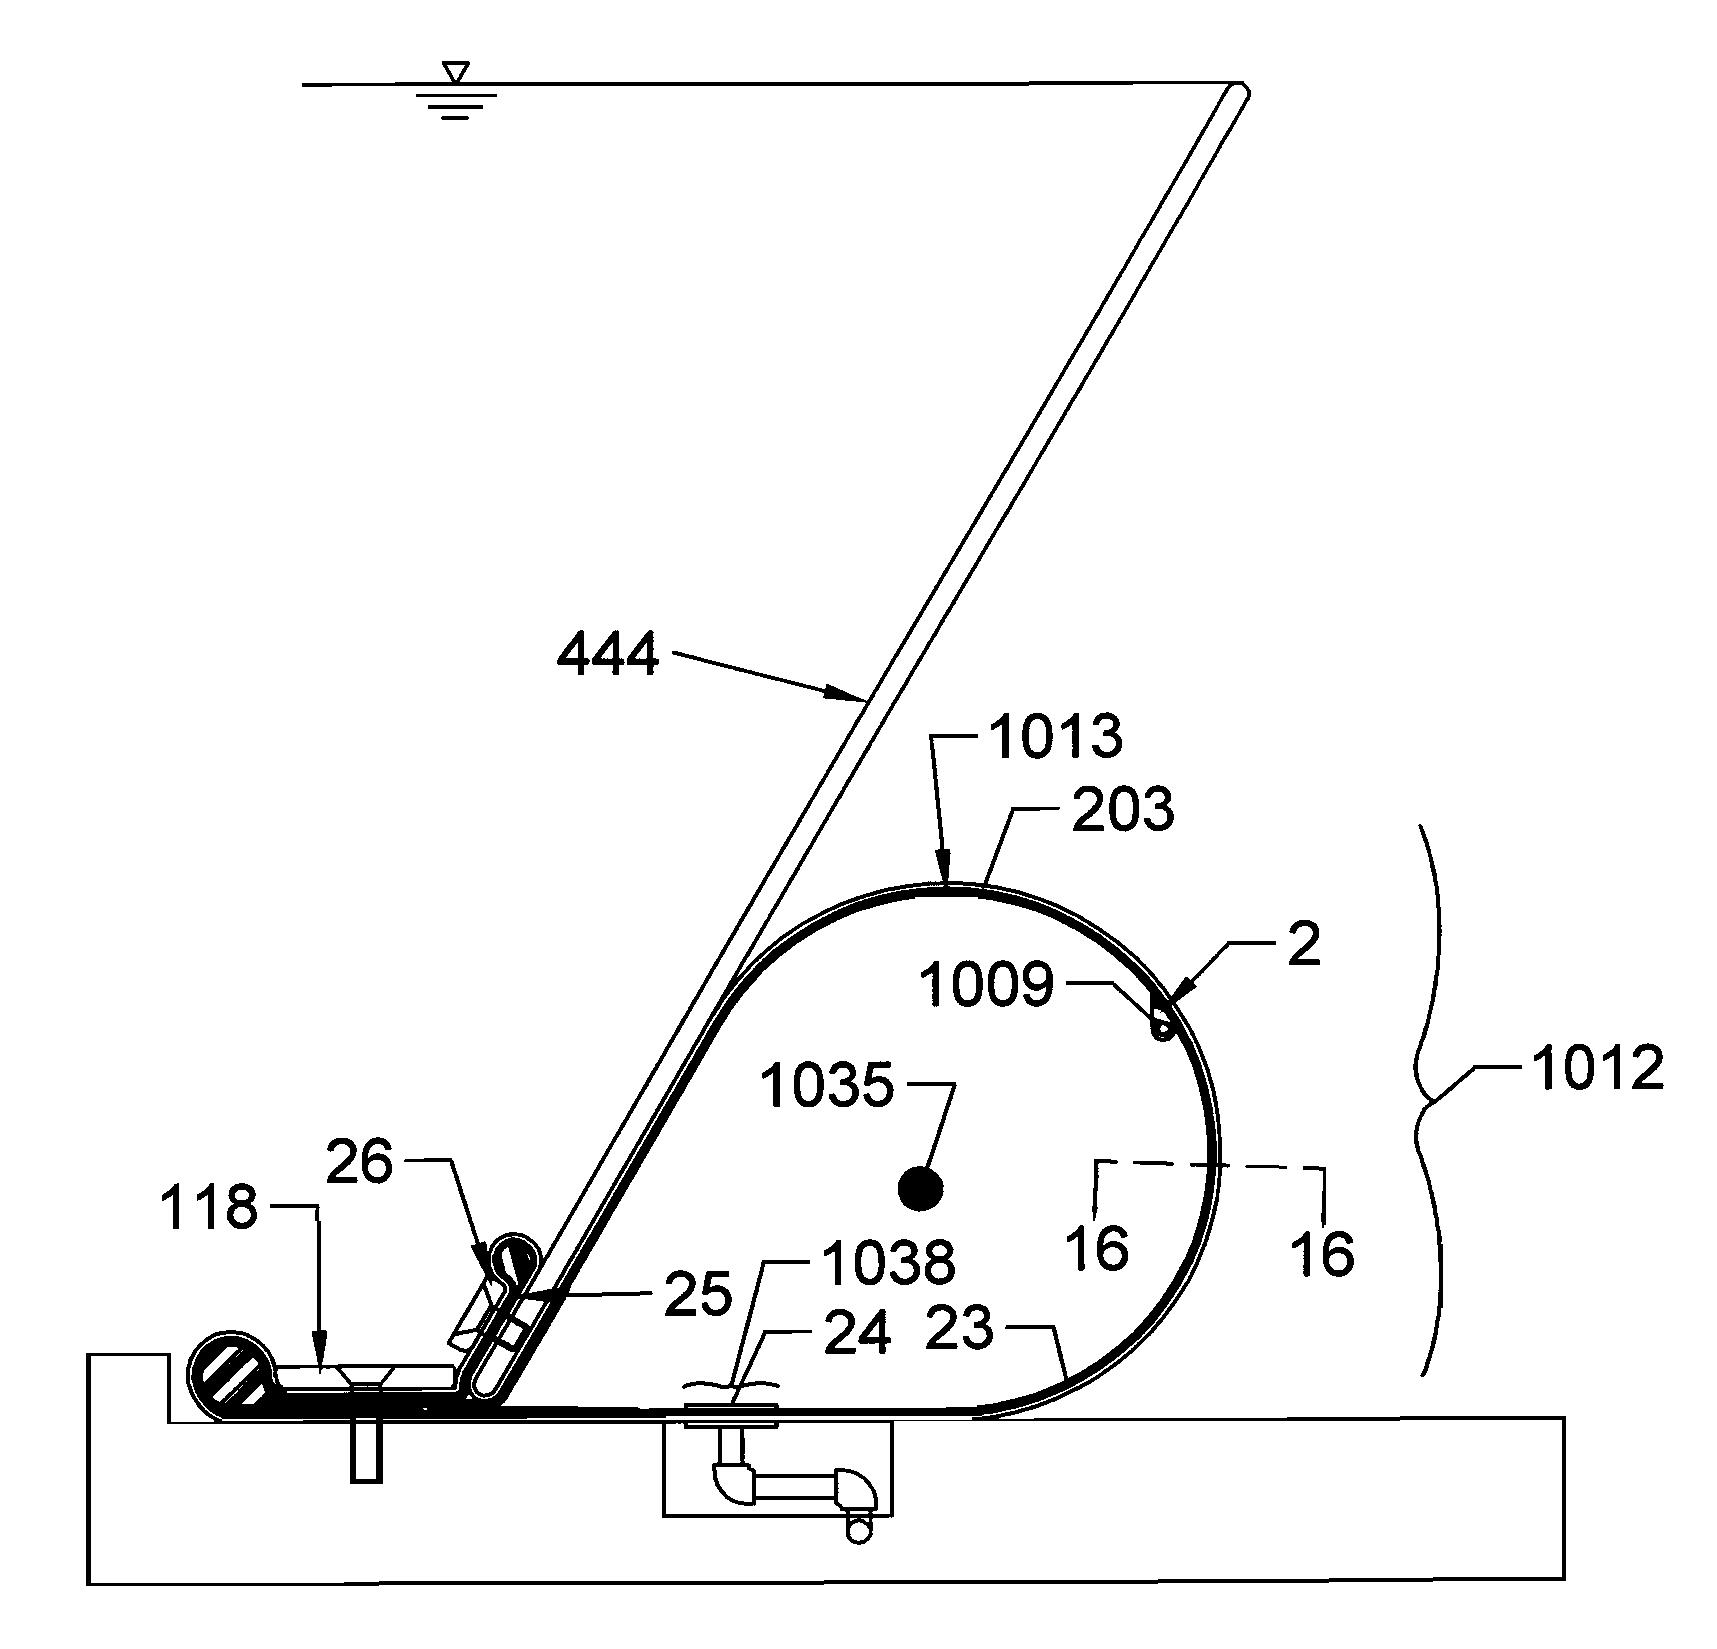 john deere 212 electric lift wiring diagram mg zr radio 214 imageresizertool com